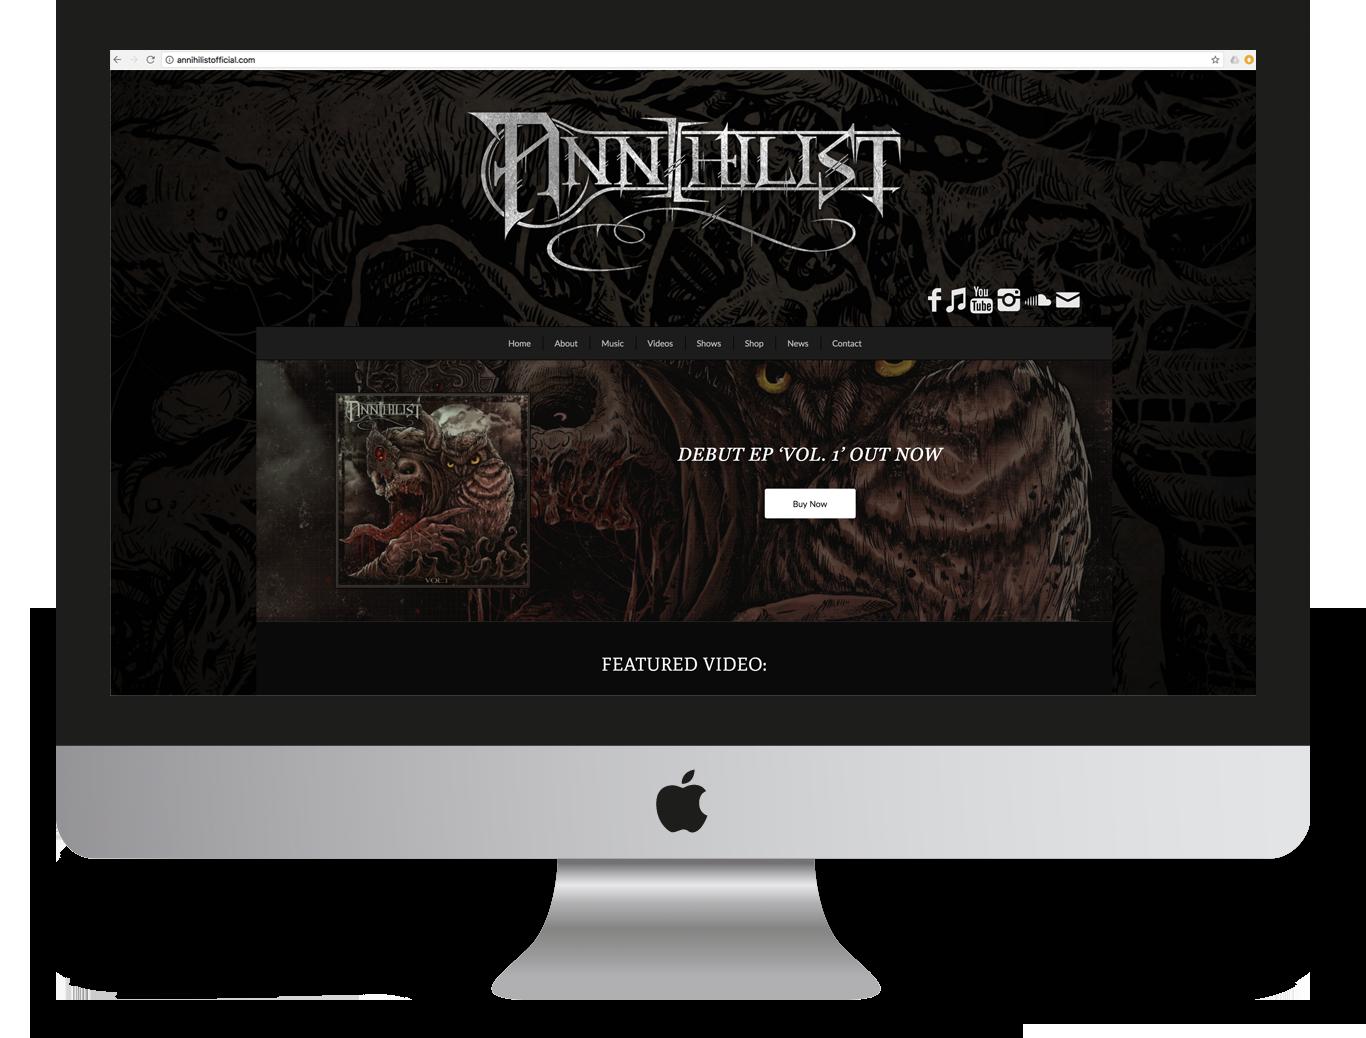 Annihilist Website Design and Development - Miki Media   Melbourne Web Design Services